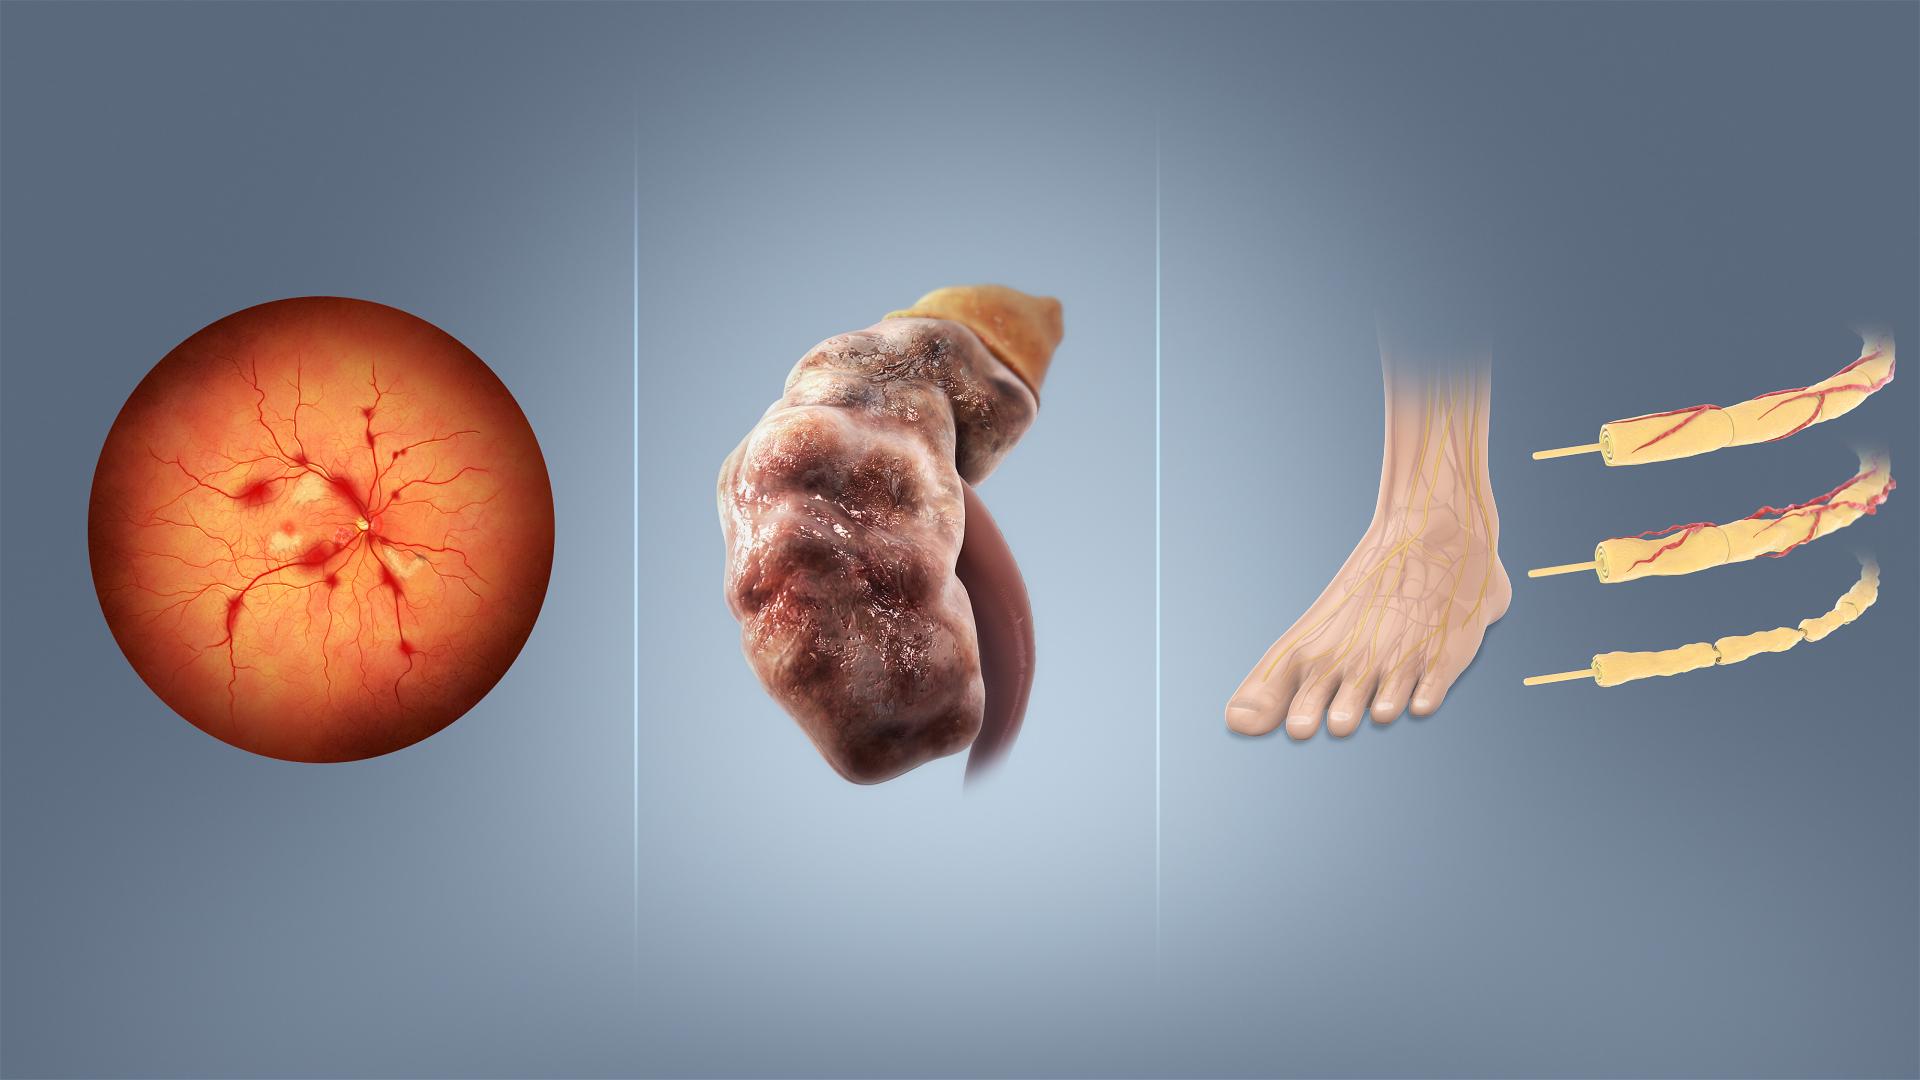 invalidnosti hipertenzija tip 2 diabetes mellitus)